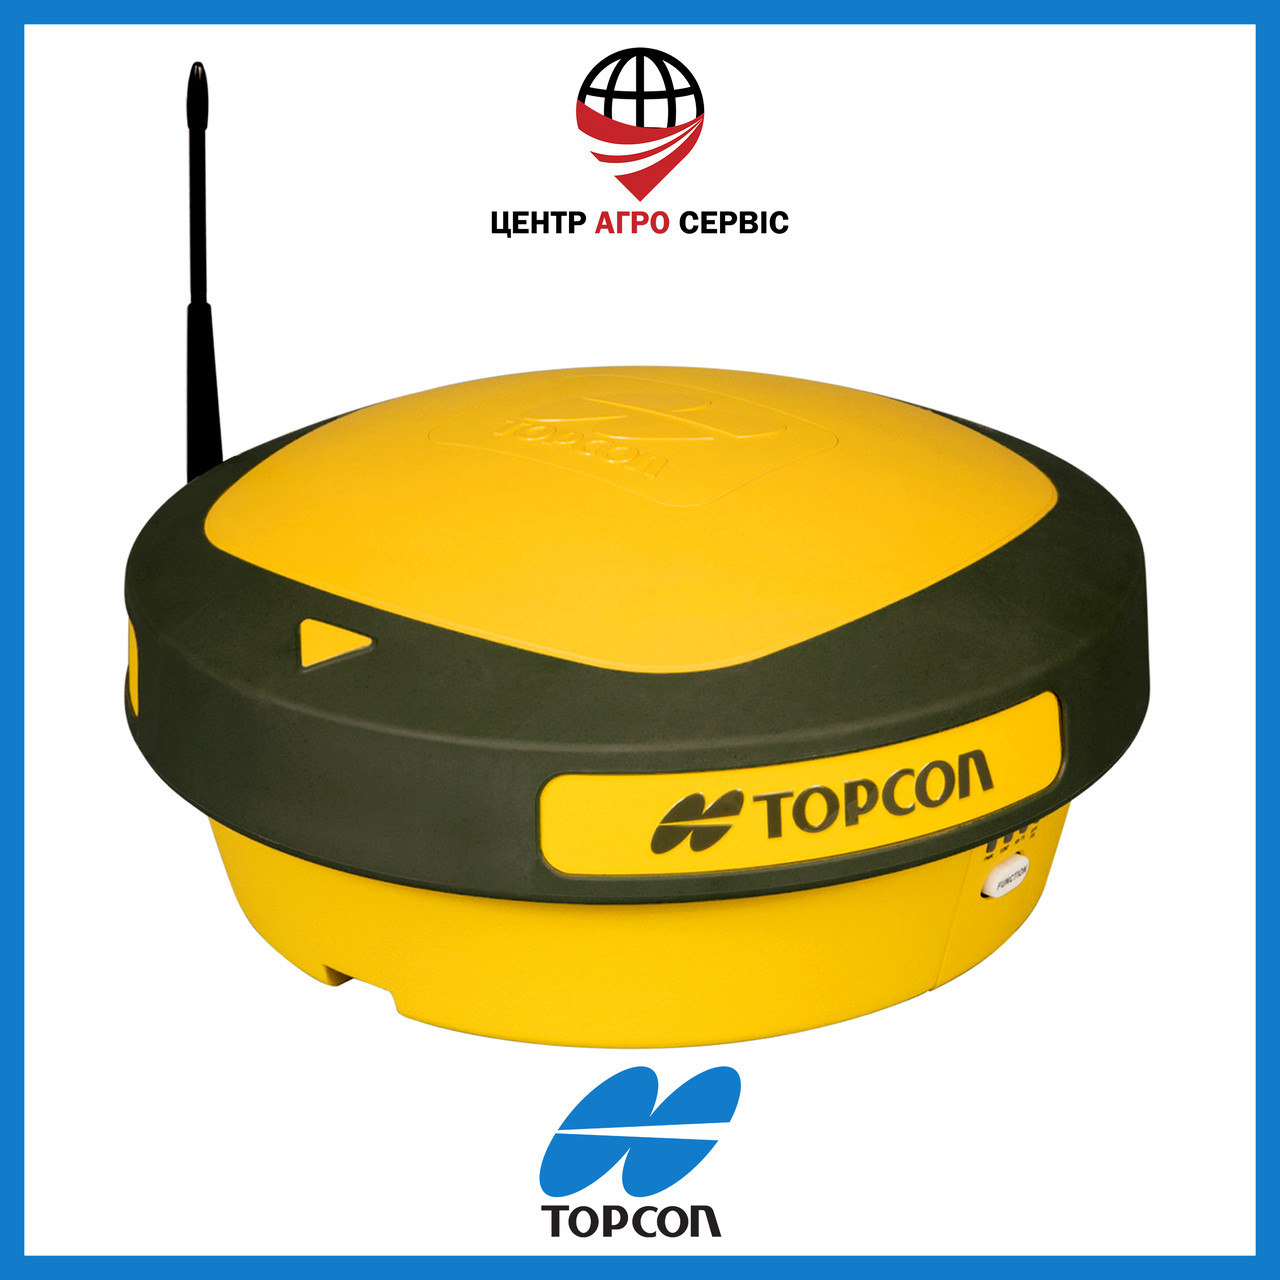 ПриемникAGI-3 Topcon, GPS и ГЛОНАСС (L1, L2)